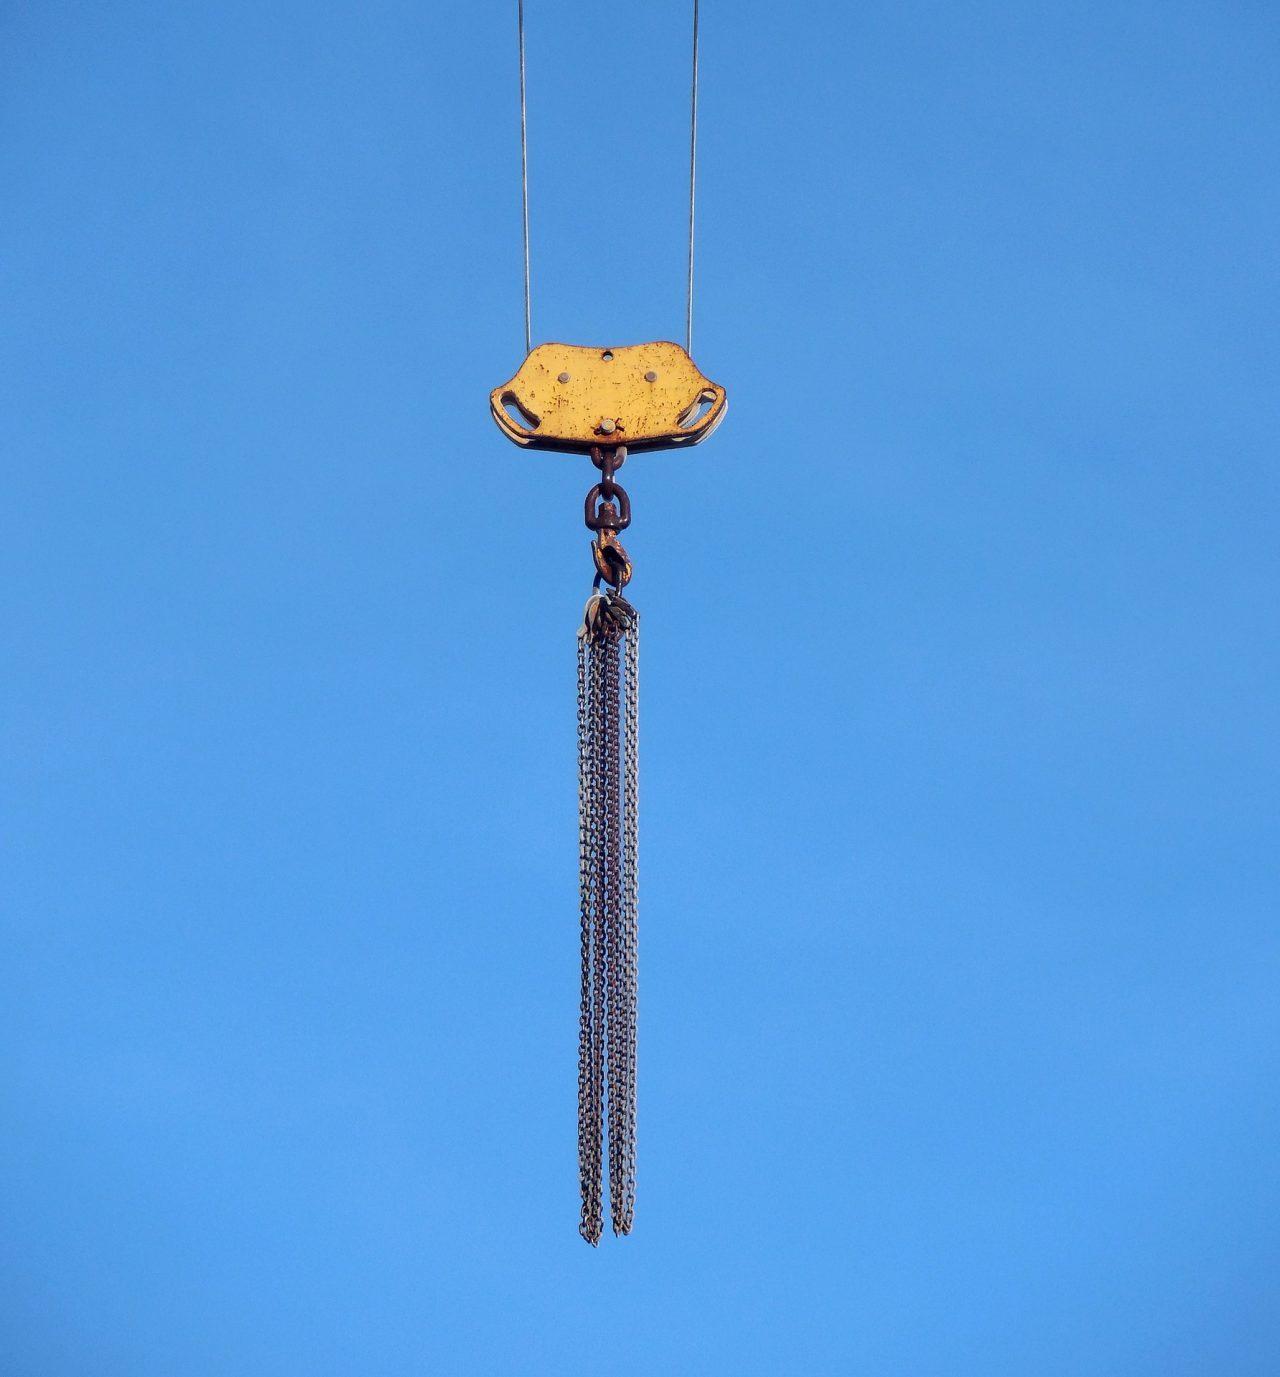 Blog | Sheedy Crane | San Francisco Cranes, Hauling & Lifting